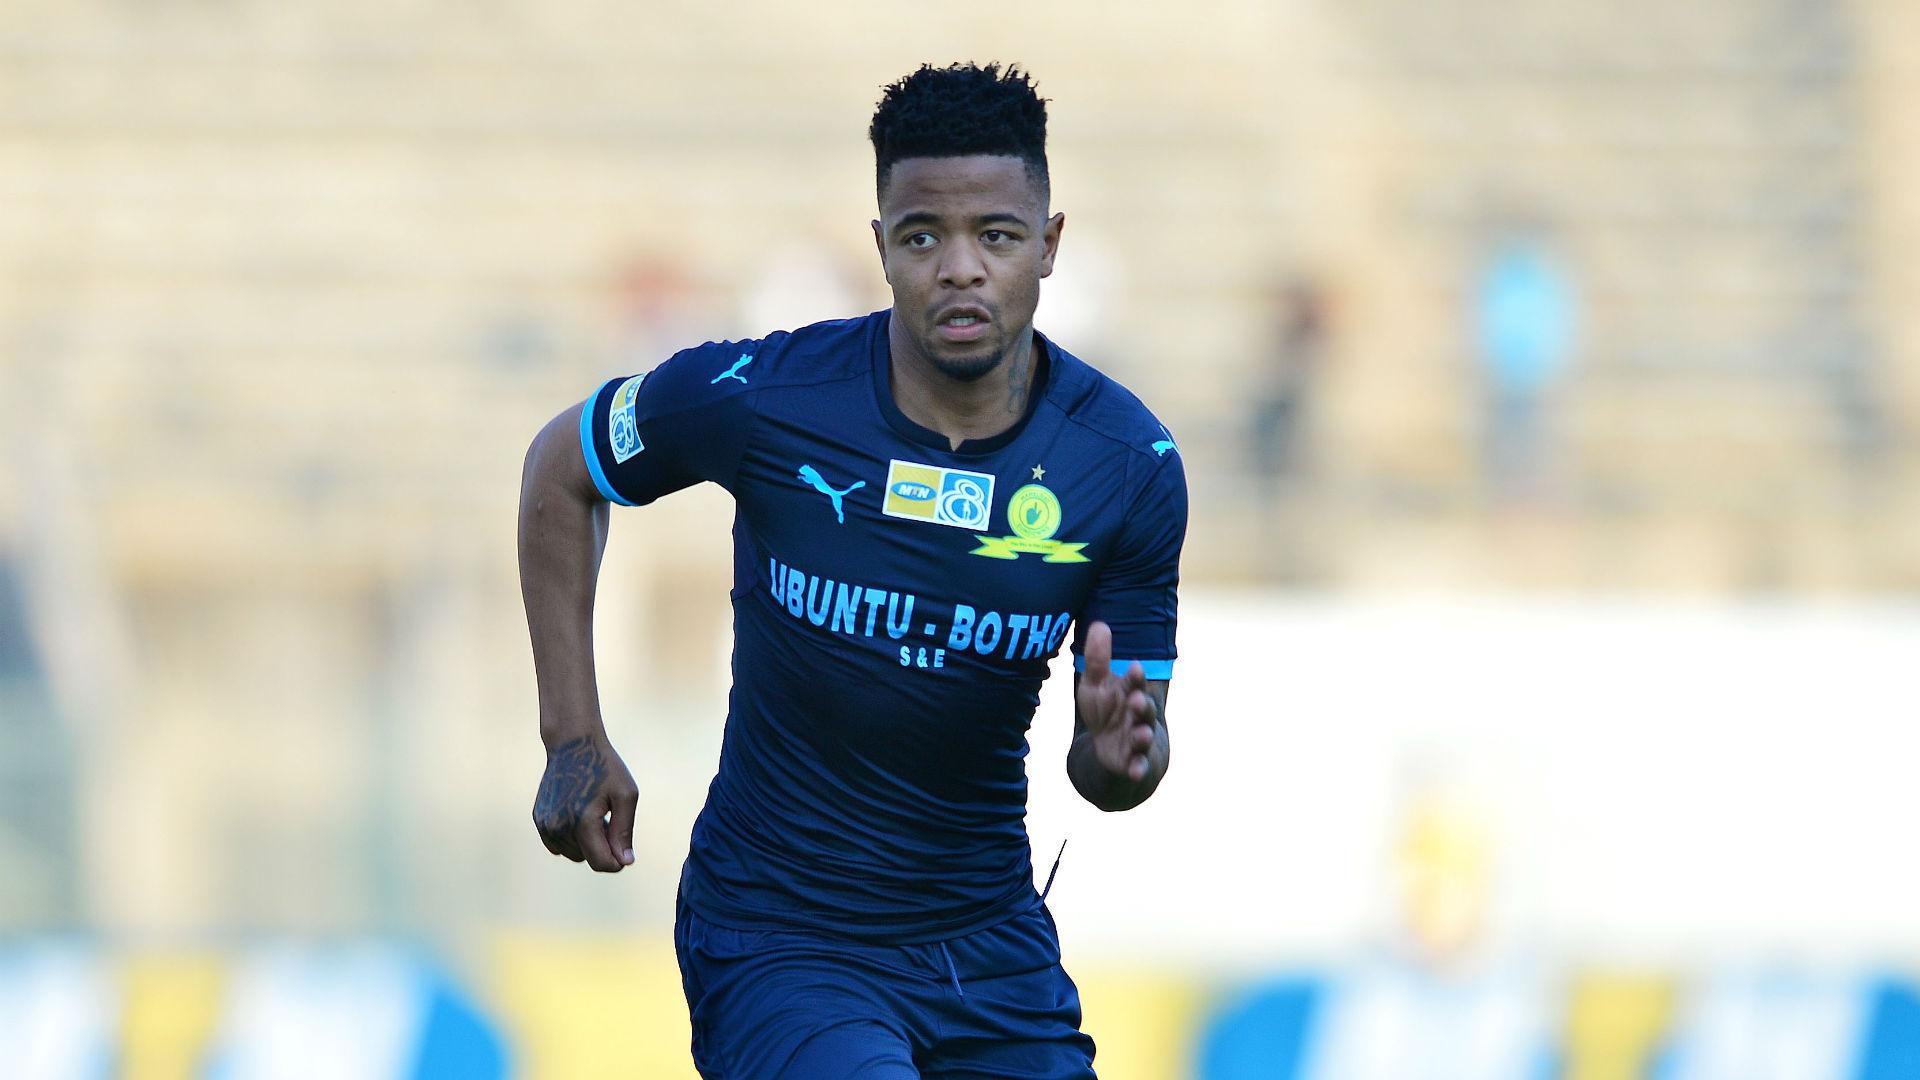 Mosimane: I can't guarantee Lebese playing time at Mamelodi Sundowns